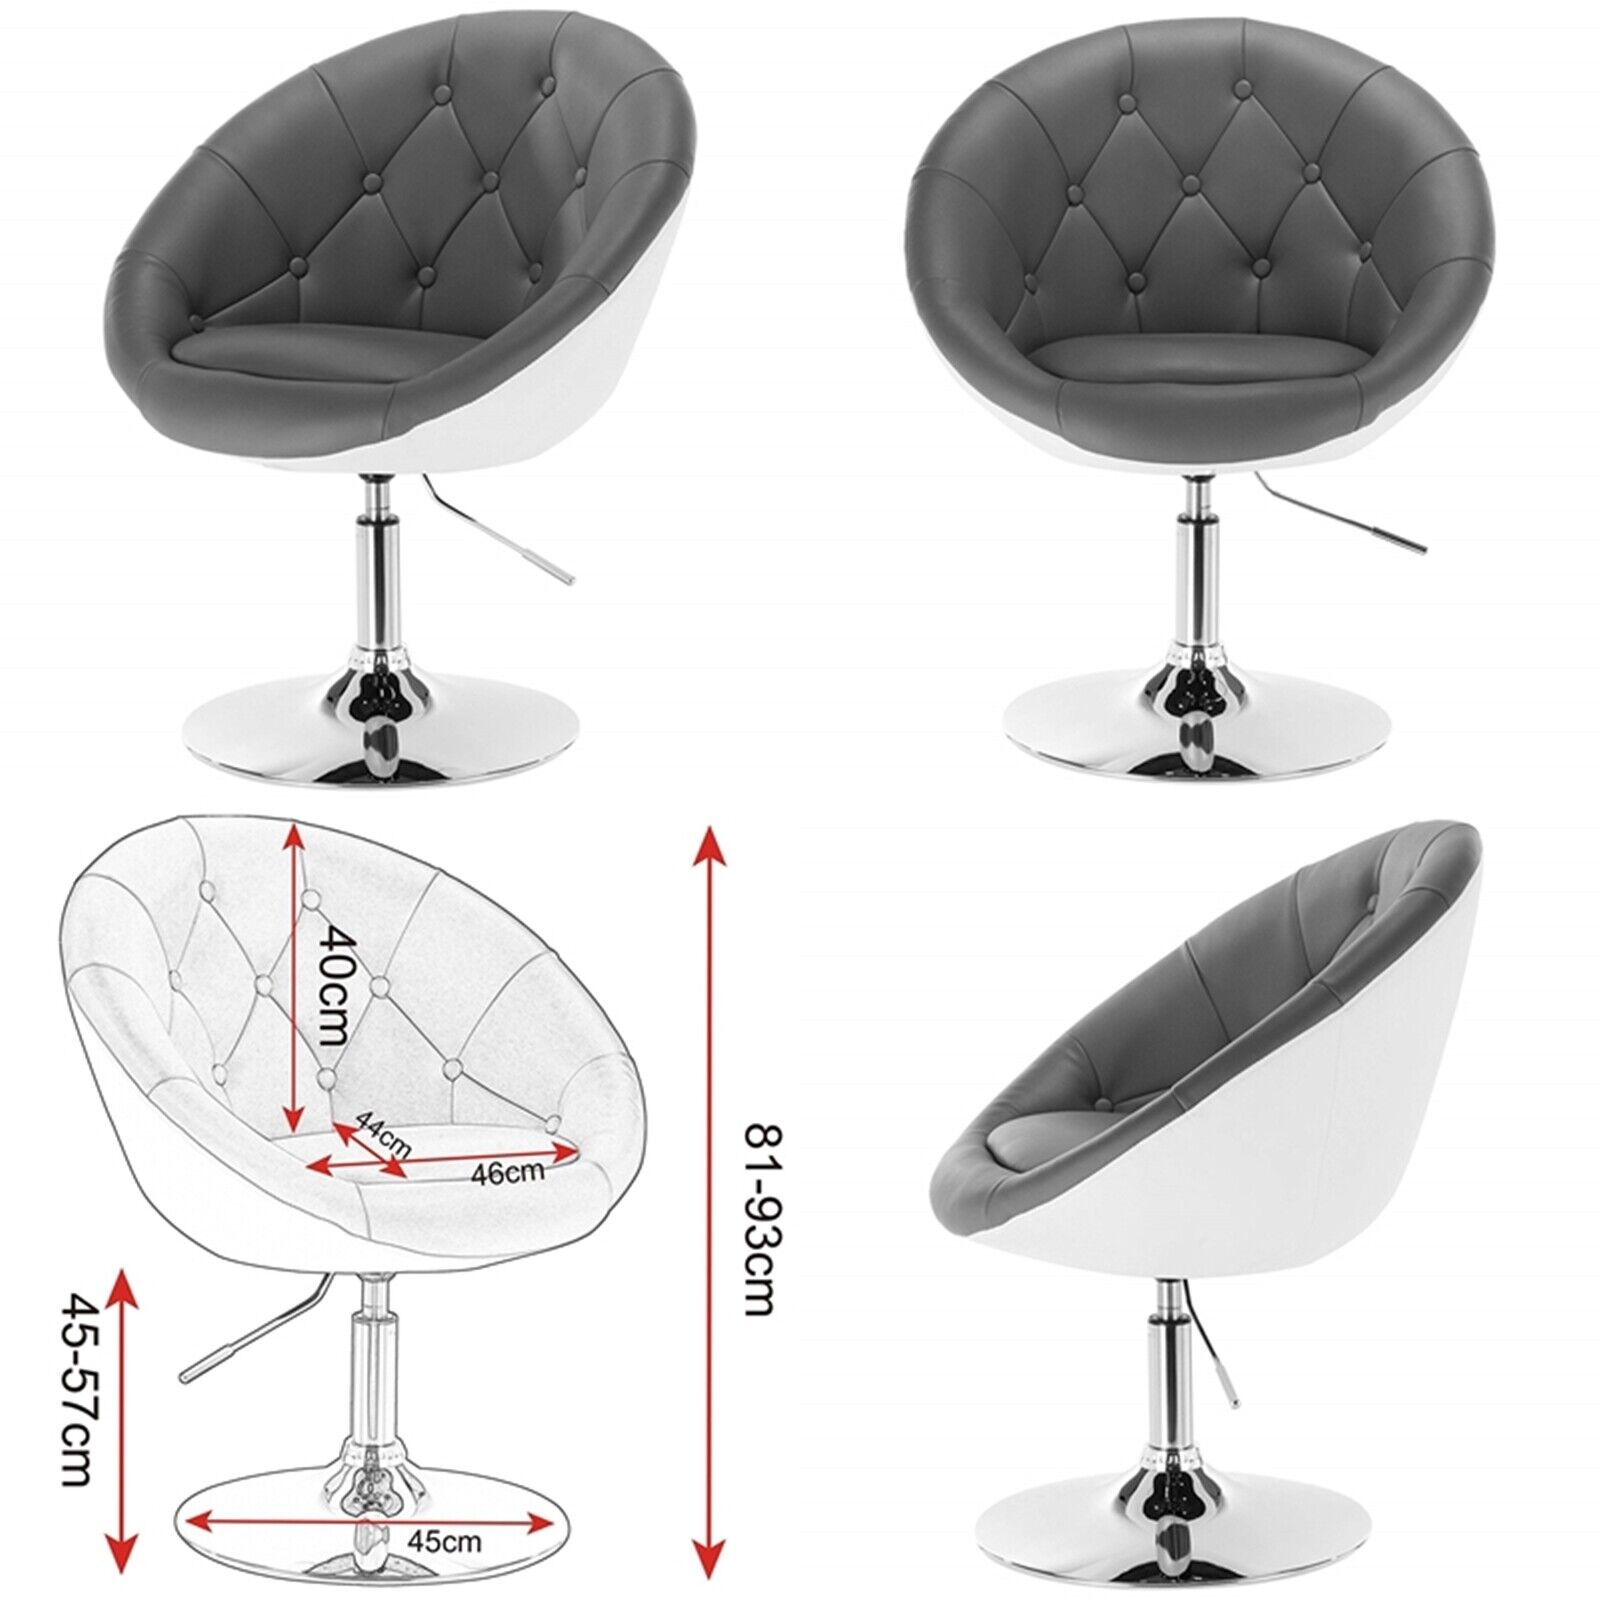 Tremendous Details About Swivel Retro Armchair Vintage Egg Seat Grey White Lounge Chair Dressing Stool Uk Ibusinesslaw Wood Chair Design Ideas Ibusinesslaworg